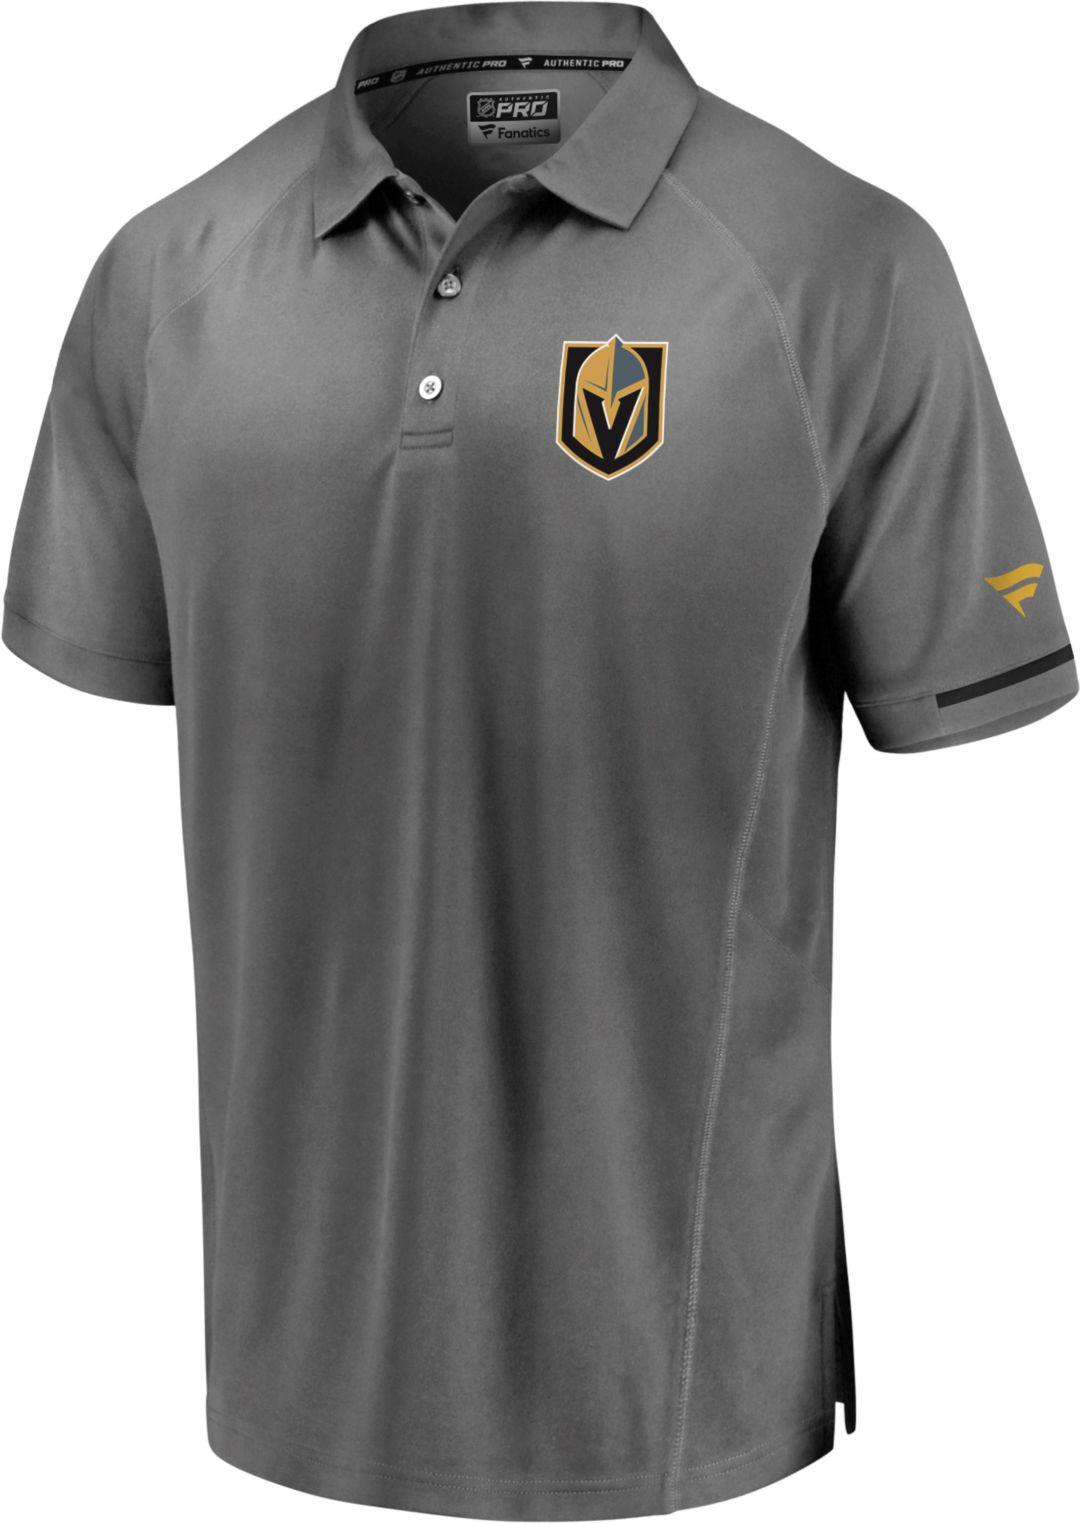 best website 187e3 c12c3 NHL Men's Vegas Golden Knights Authentic Pro Rinkside Grey Polo